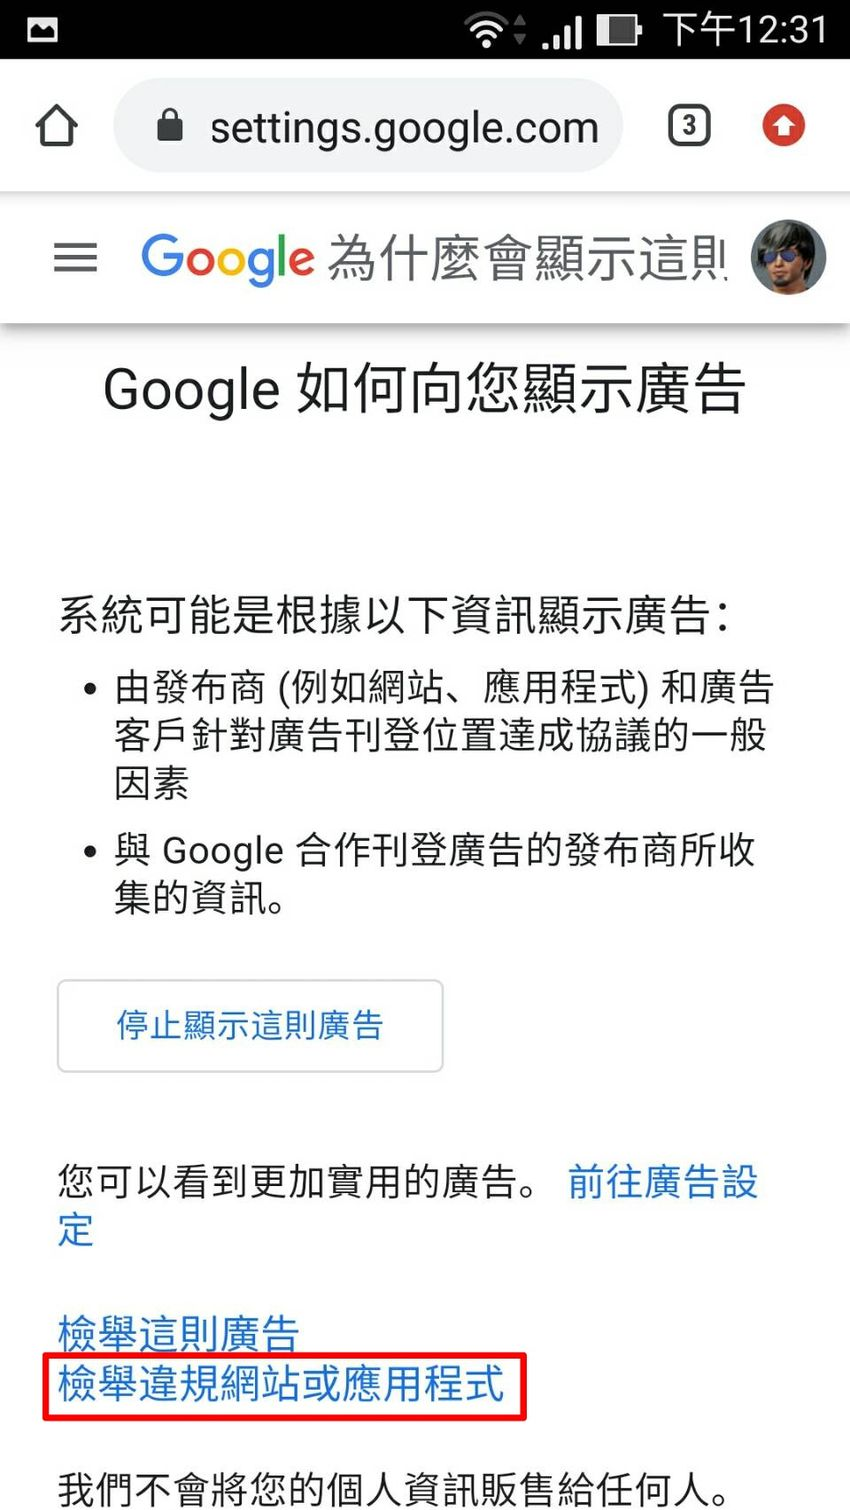 app-plagiarism-prosecute-11.jpg-檢舉侵權抄襲的 APP 使其下架(連同 Adsense)流程實錄